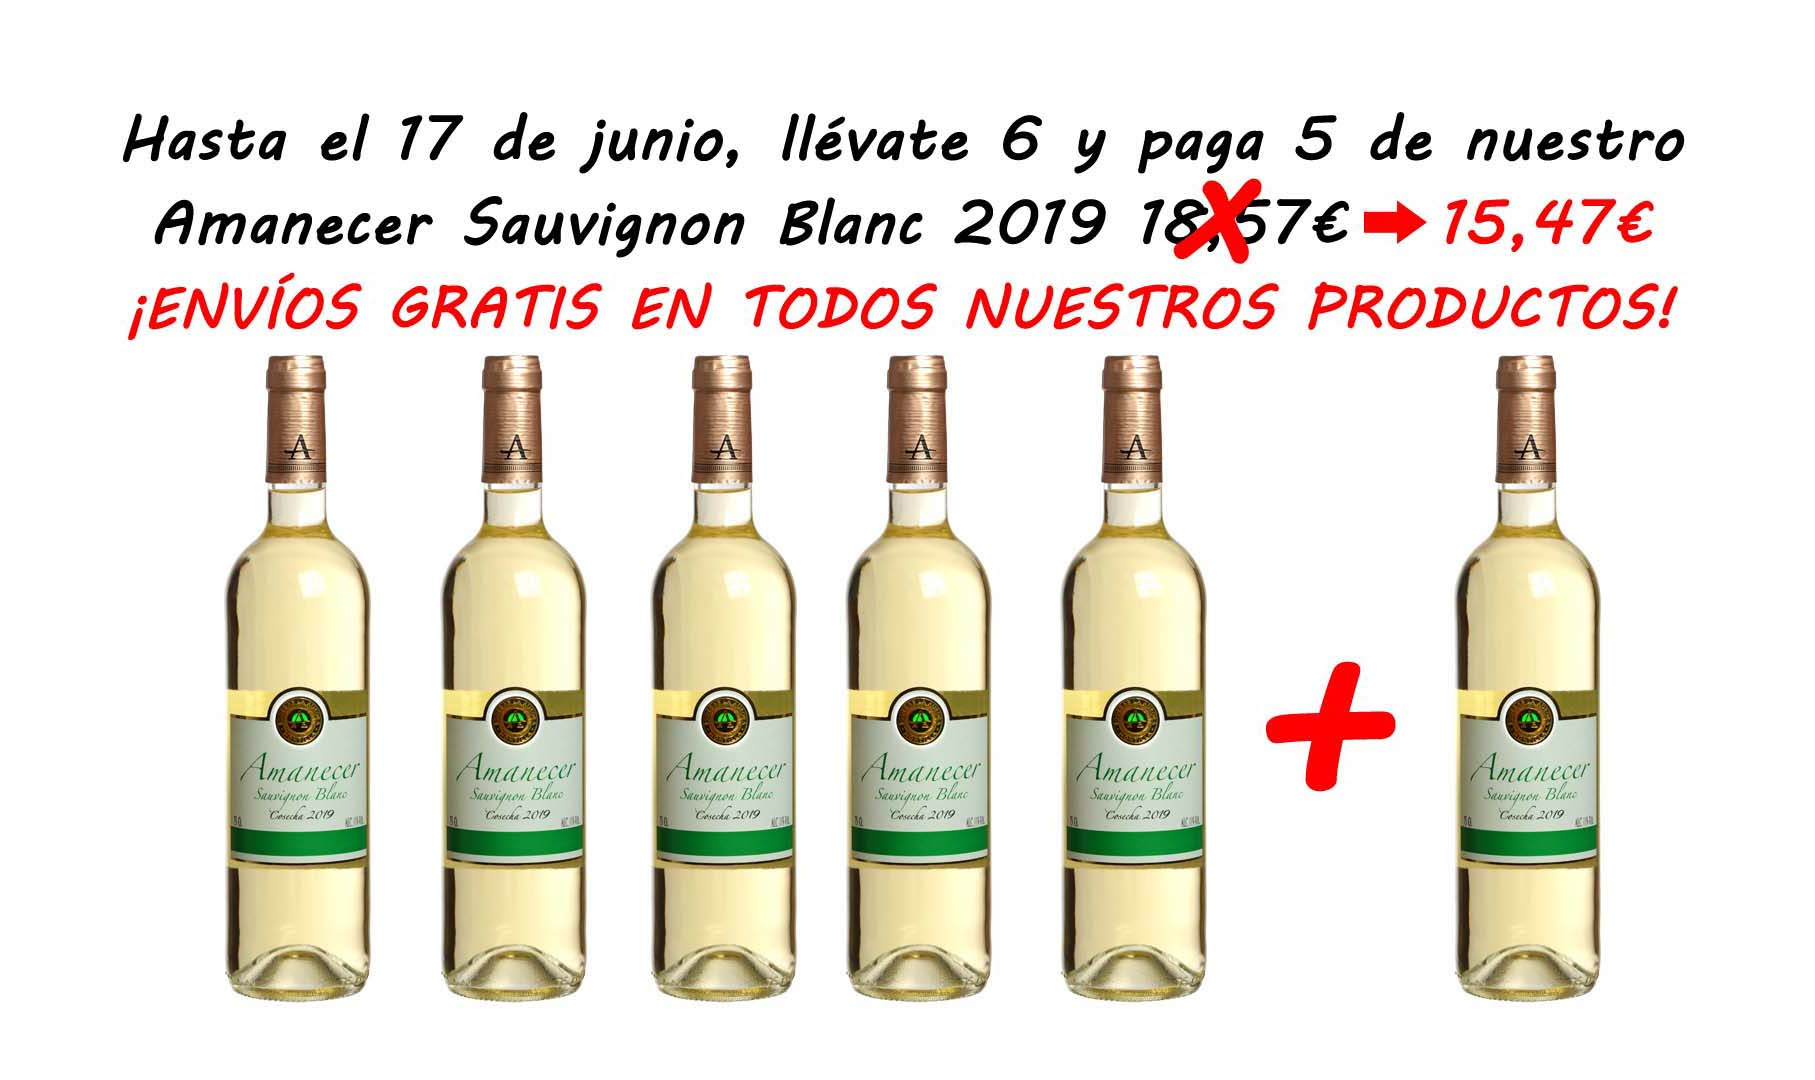 Blanco Joven Sauvignon Blanc 2019 6 x 5